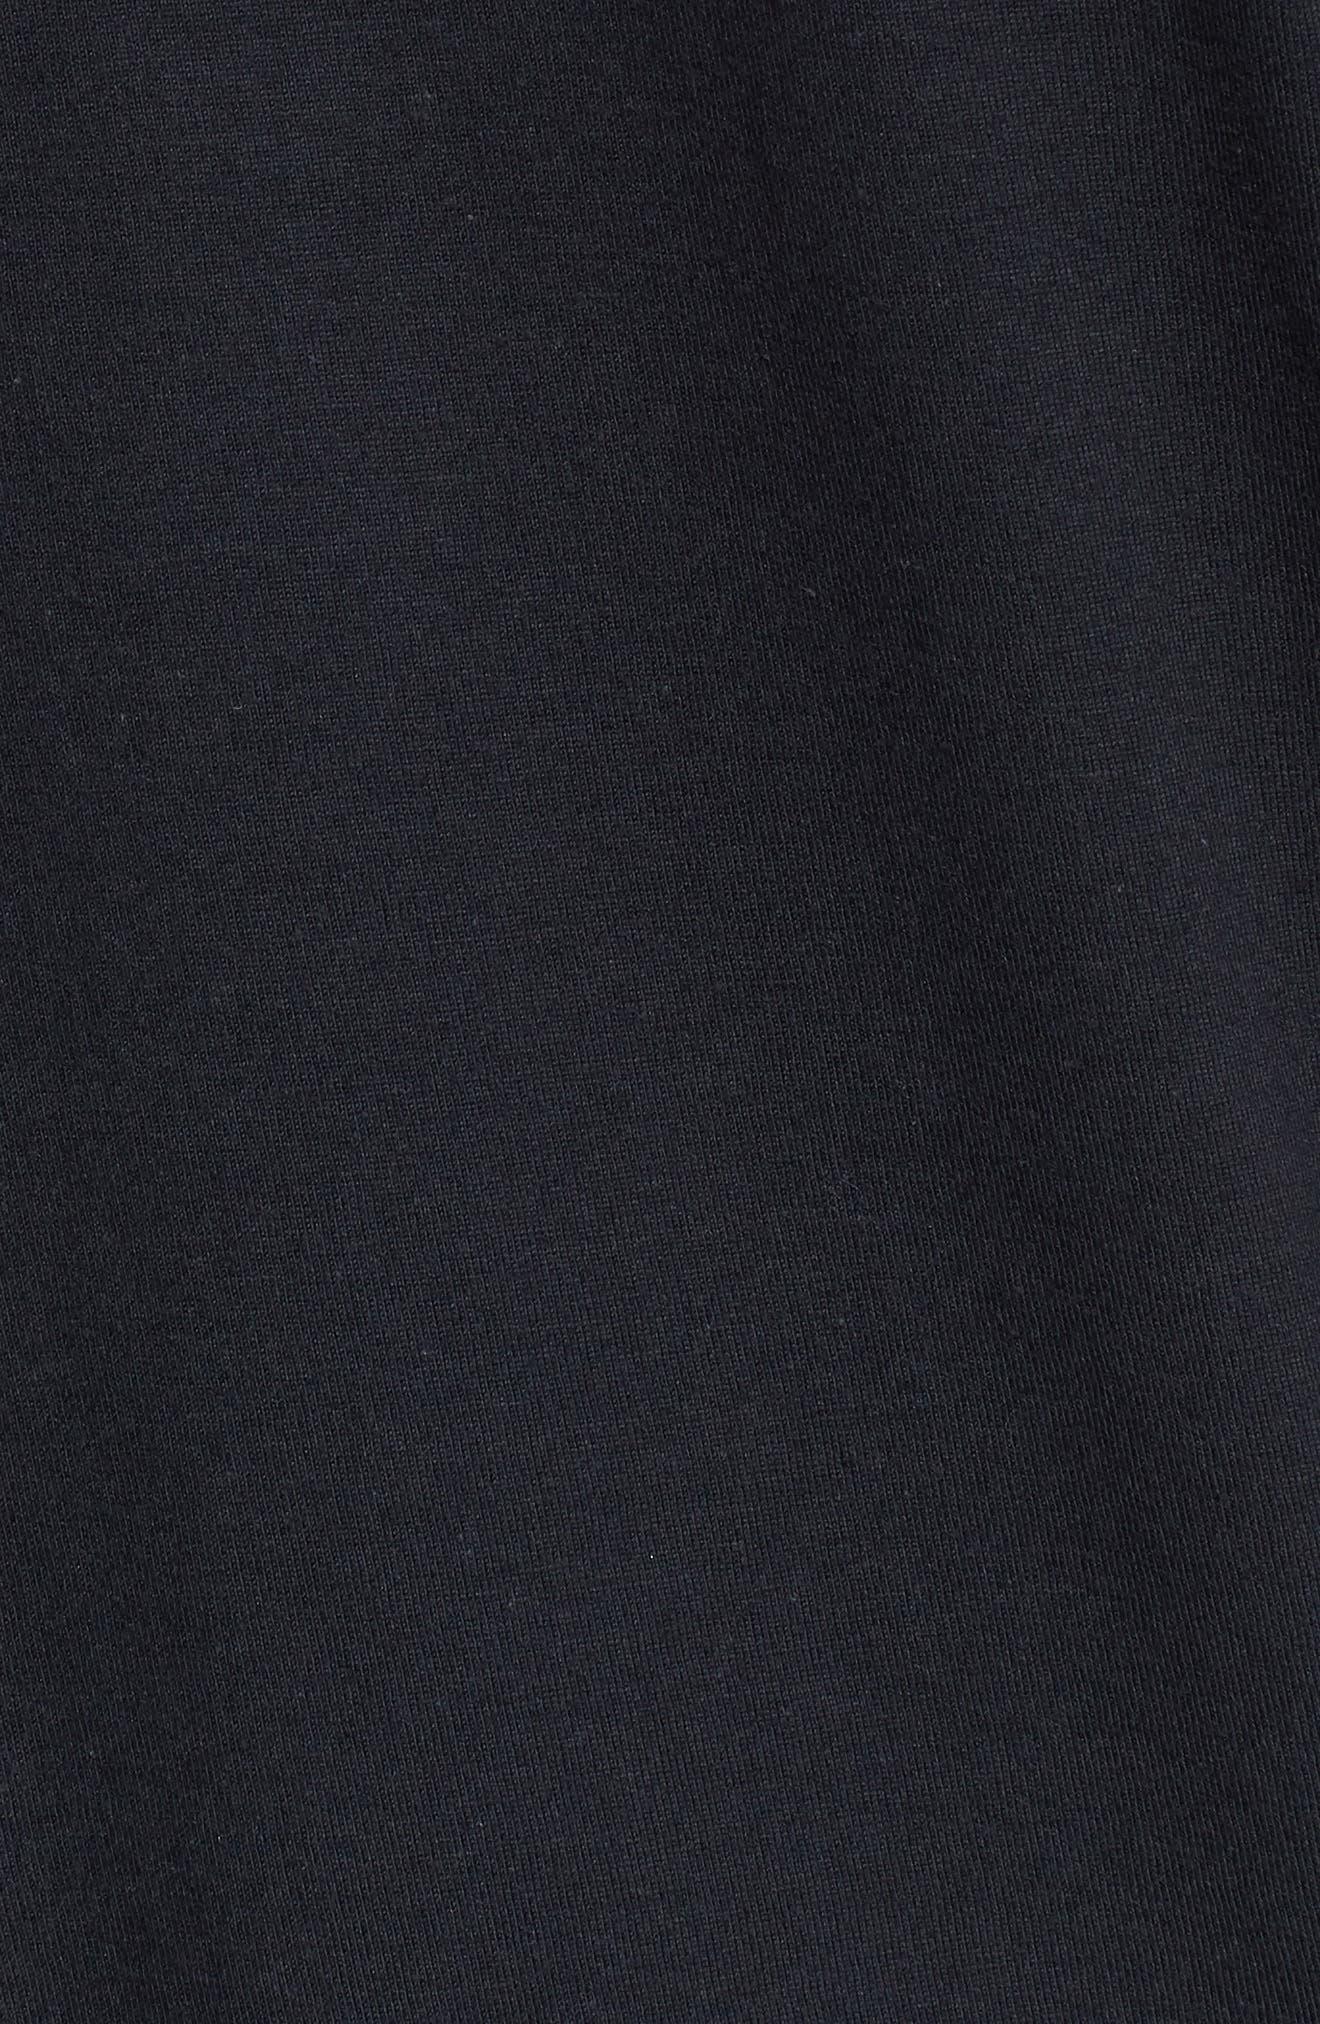 Sportswear 23 T-Shirt,                             Alternate thumbnail 3, color,                             Black/ Infrared 23